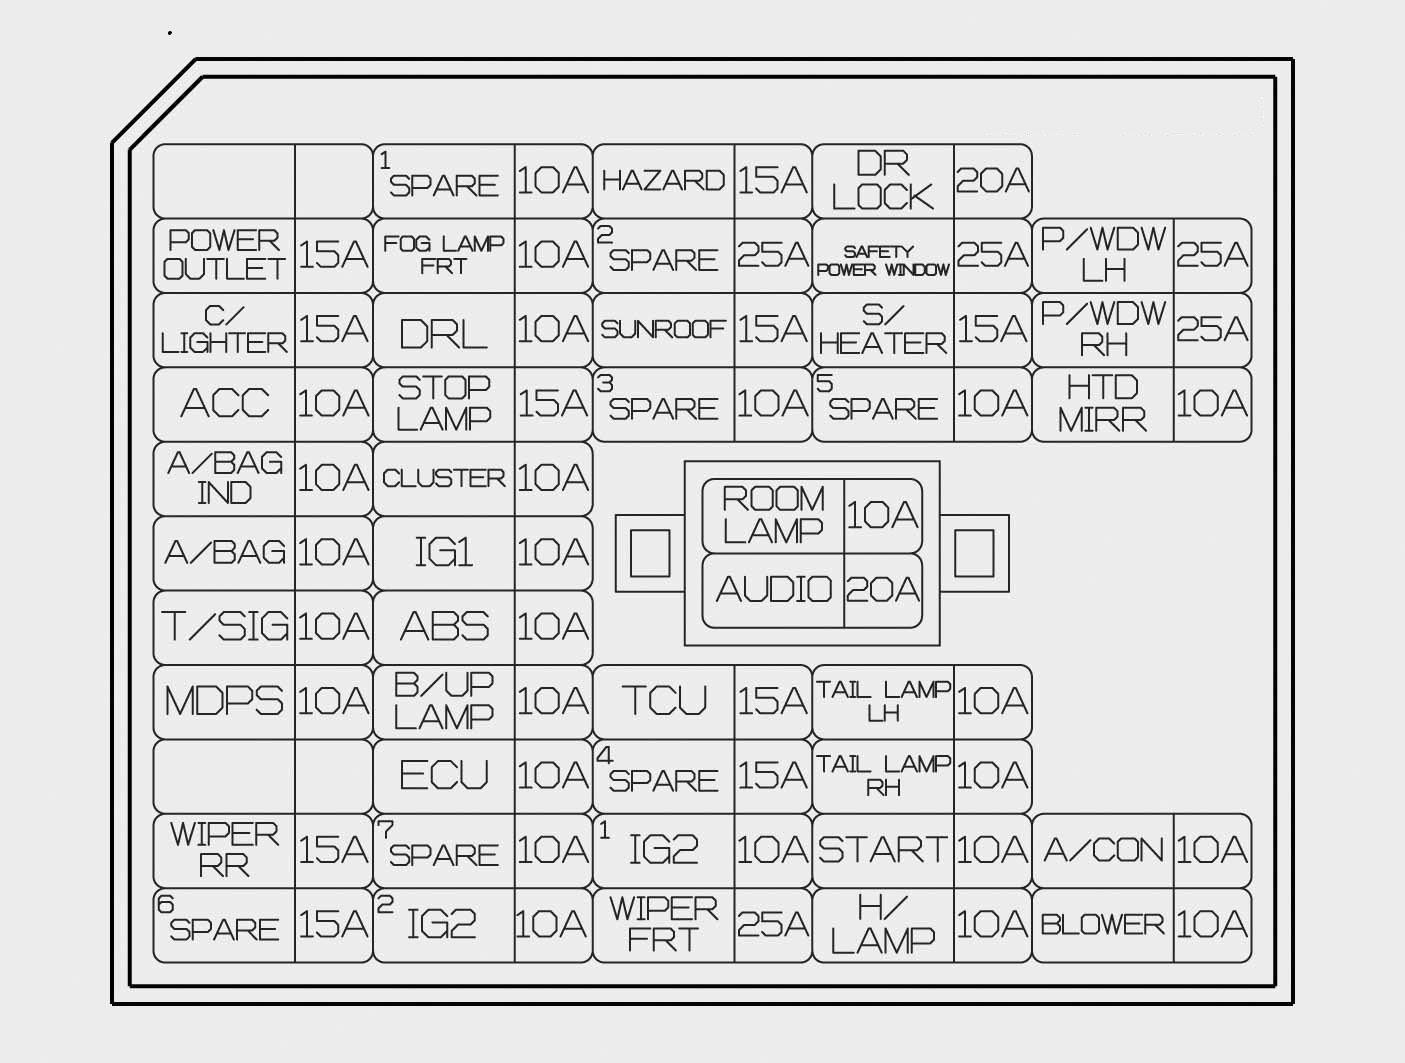 Diagram Lexus 470 Lx Fuse Diagram Full Version Hd Quality Fuse Diagram Diagramhodol Unanimaleundono It